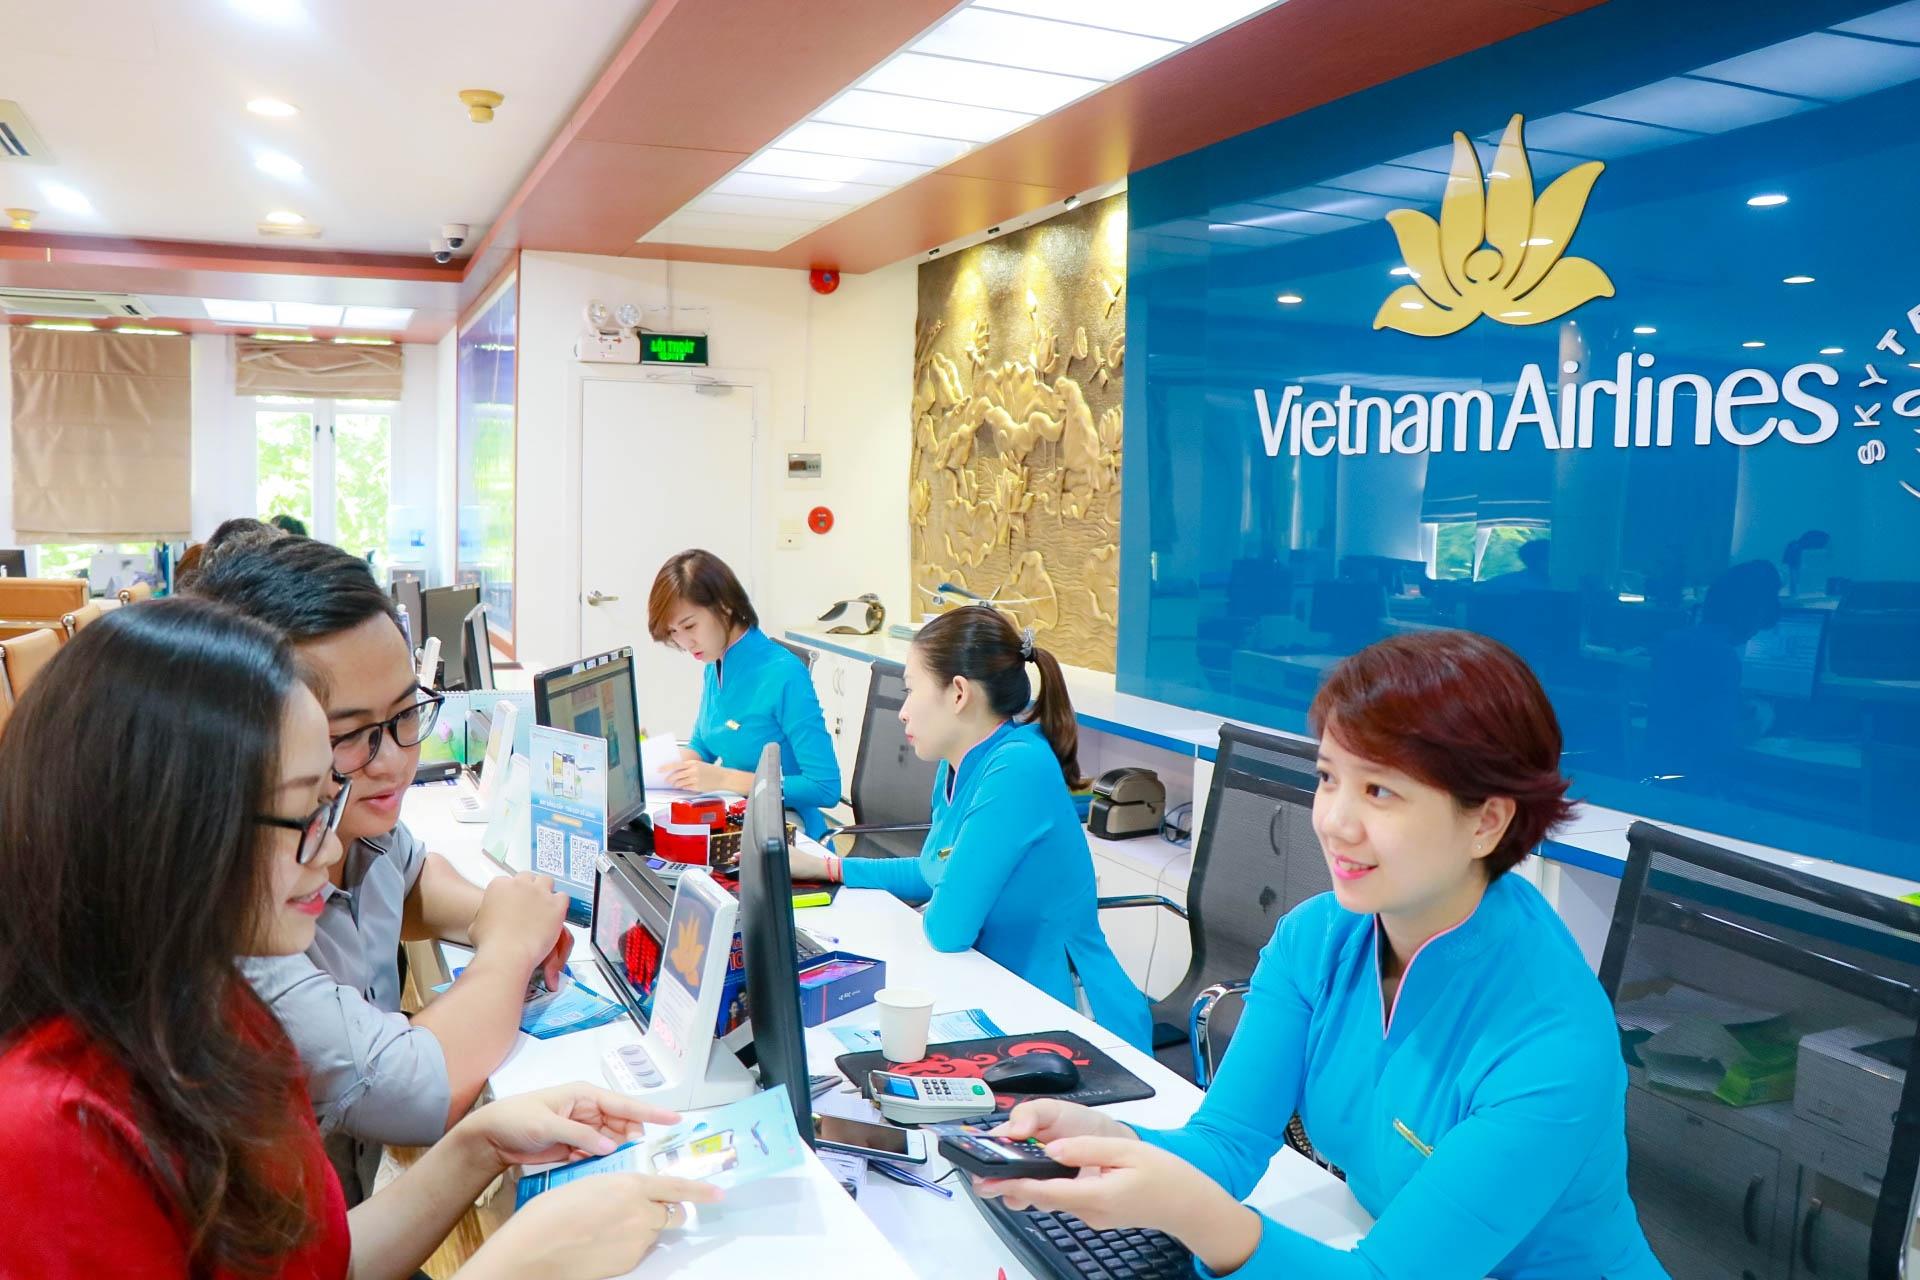 ngan luong hop tac cung vietnam airlines trien khai mua ve may bay tra gop lai suat 0